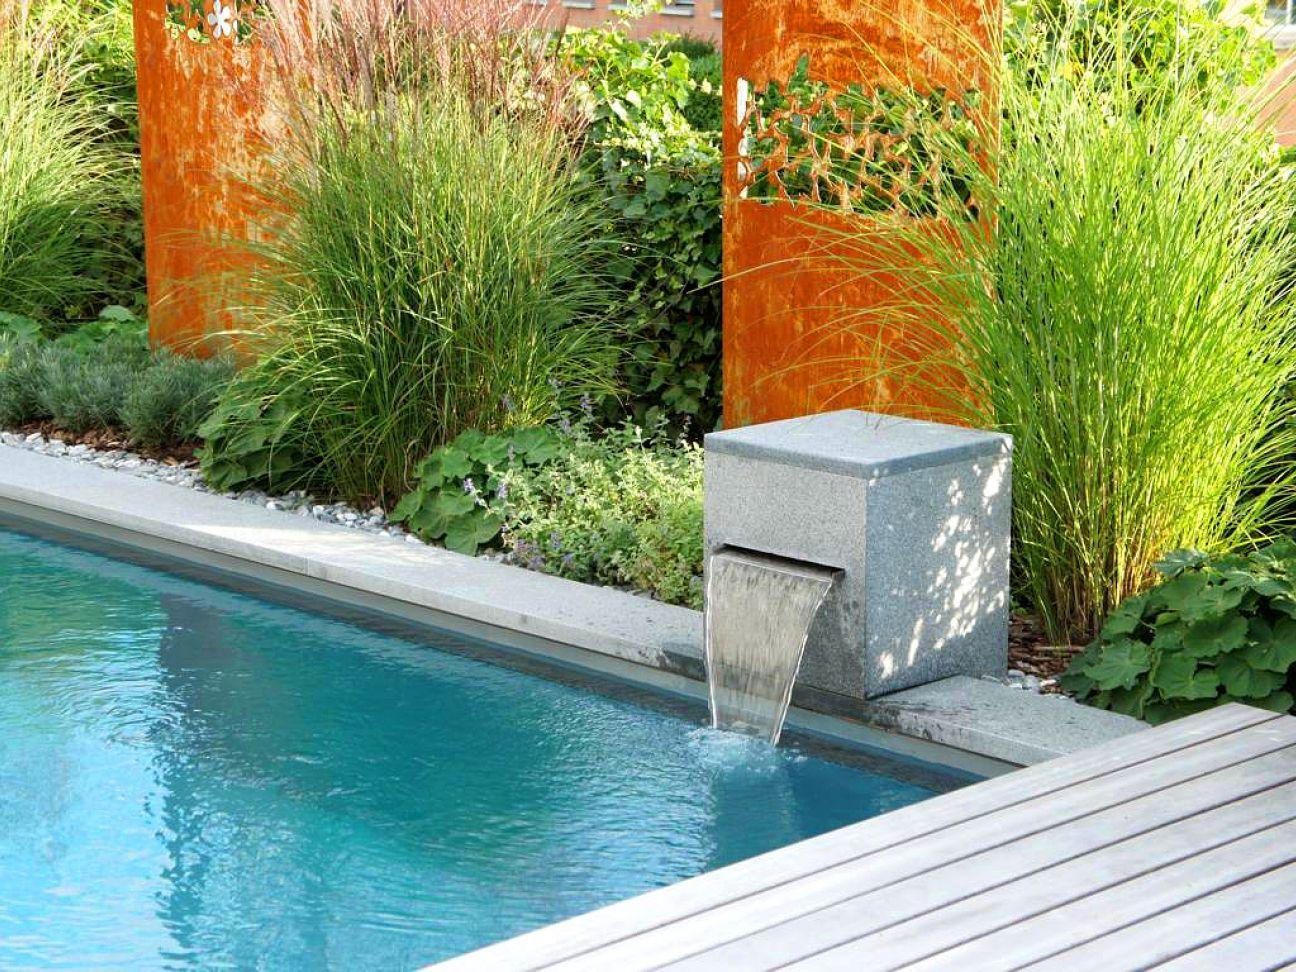 living pool swimmingpool schwimmteich gartenbau gartenumbau gartenpflege. Black Bedroom Furniture Sets. Home Design Ideas